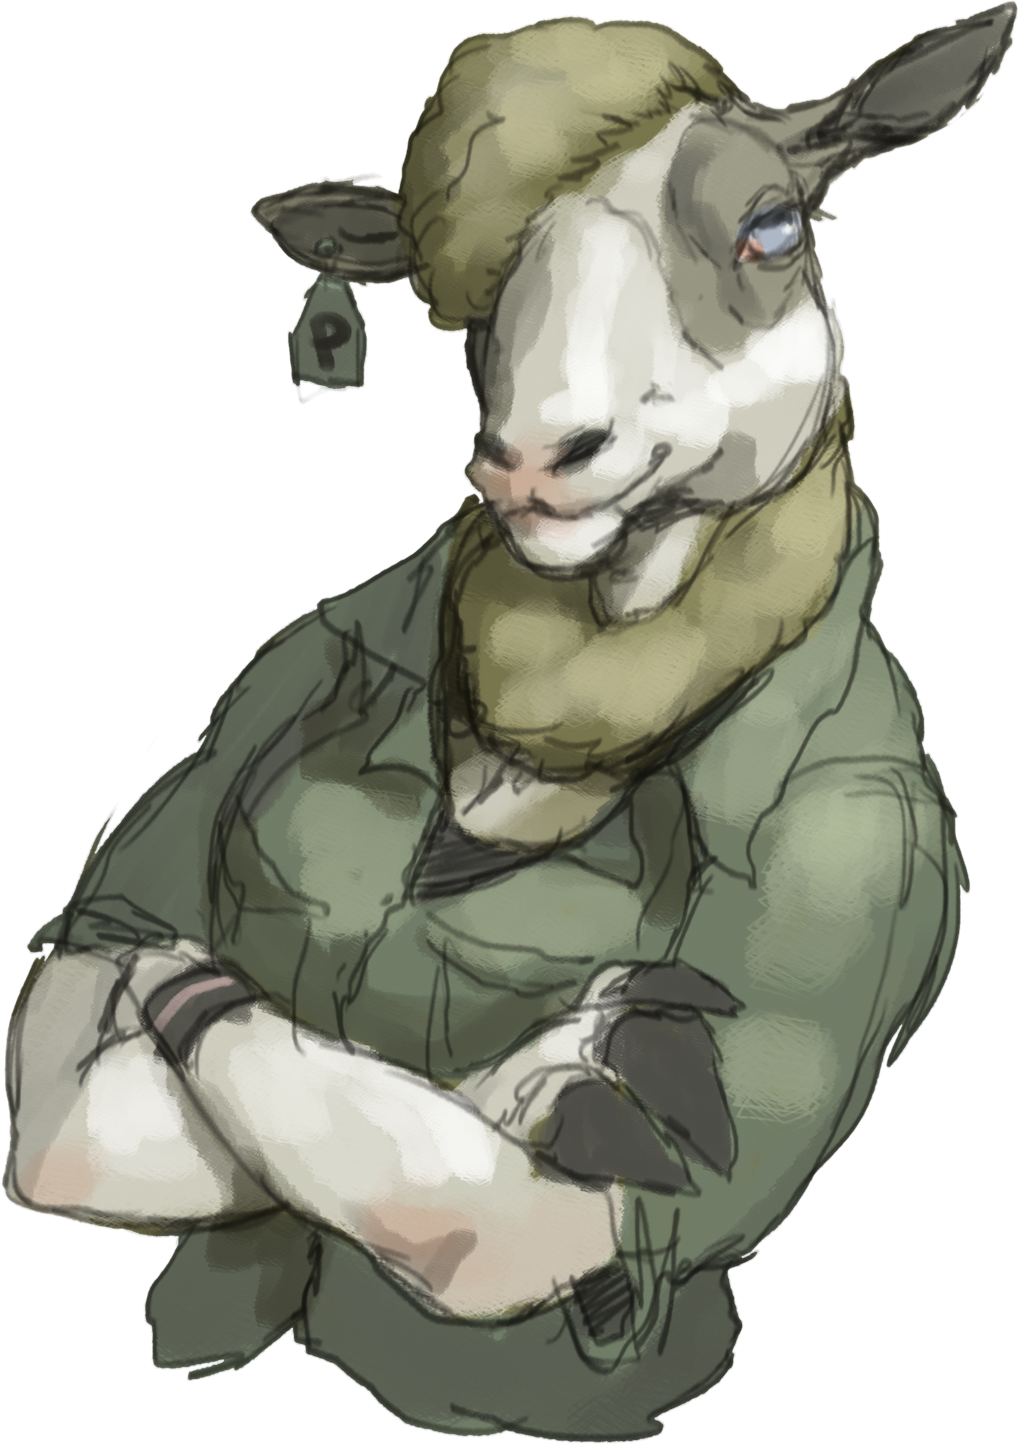 BASELARDER's Profile Picture